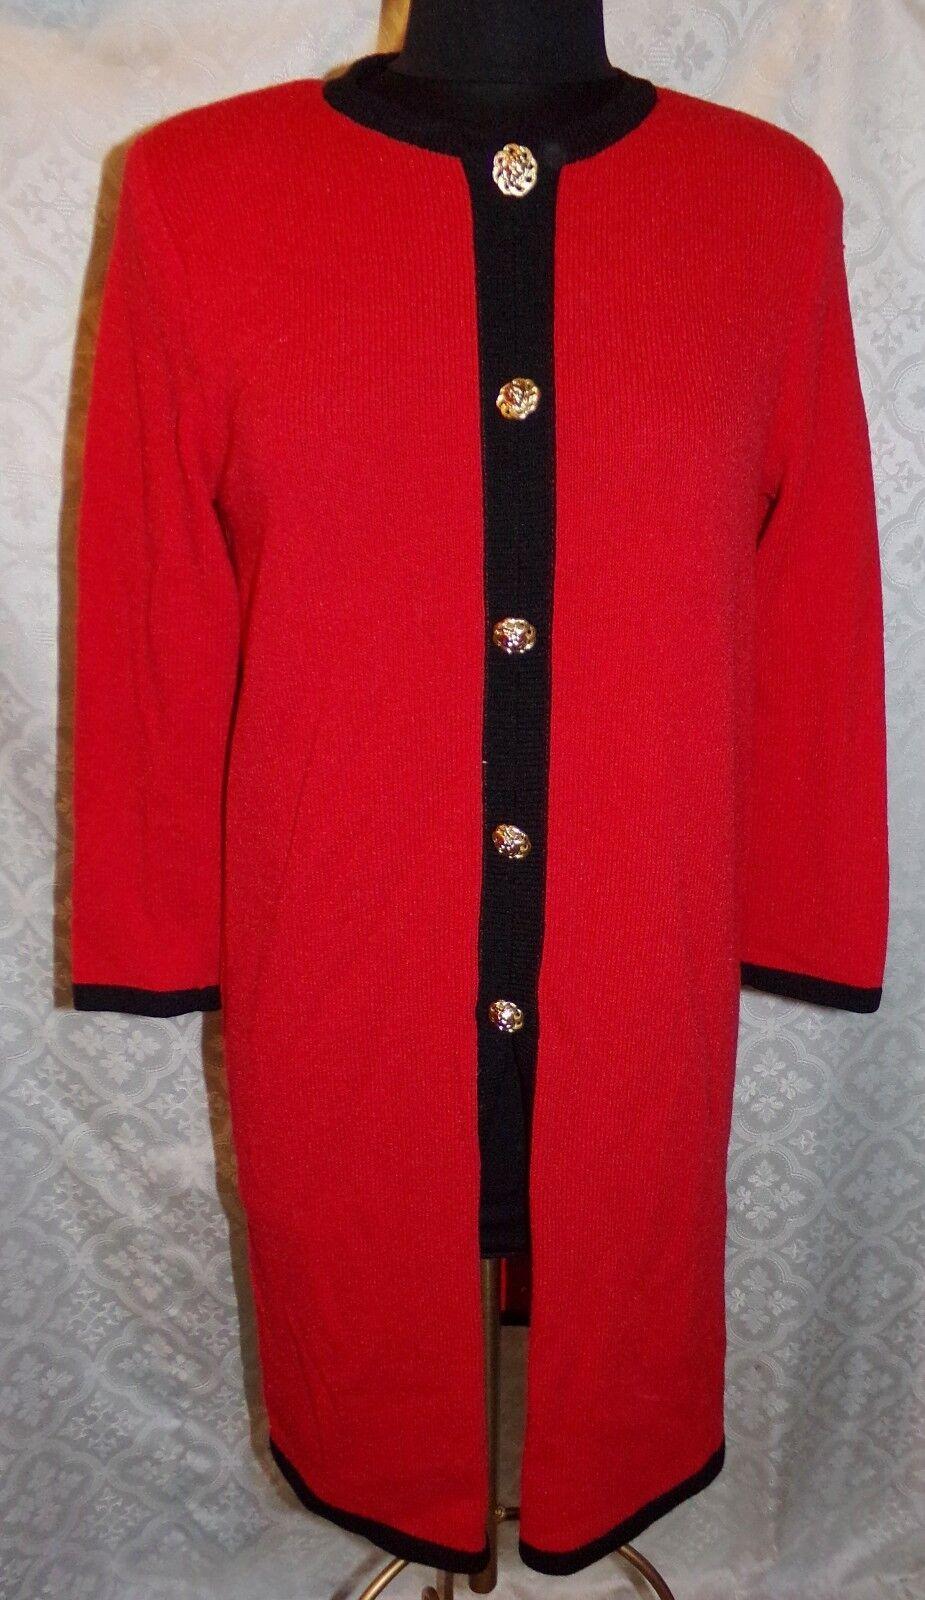 Leamond Dean Knit Dress Womens Dress Cardigan Sweater Red S   M